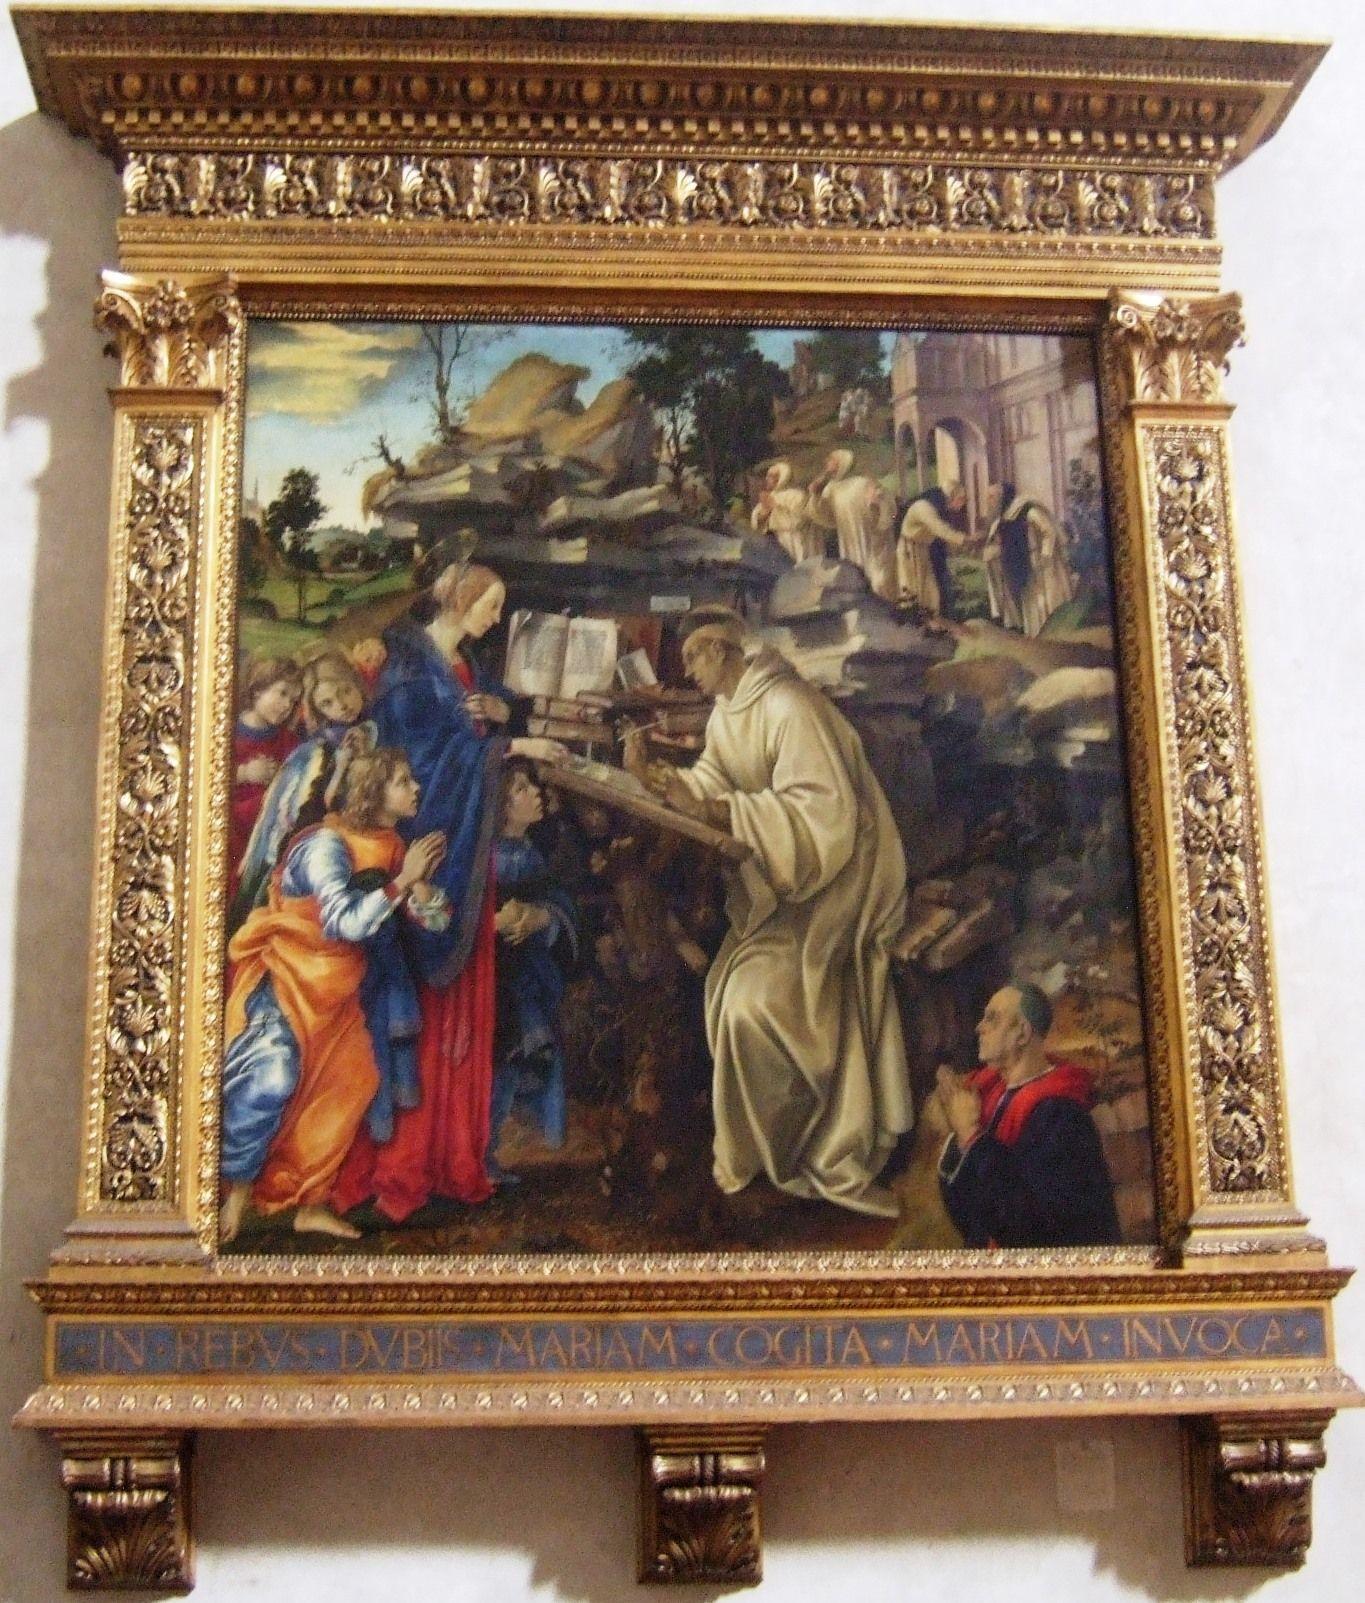 Filippino Lippi, Madonna appearing to St. Bernard (1485)